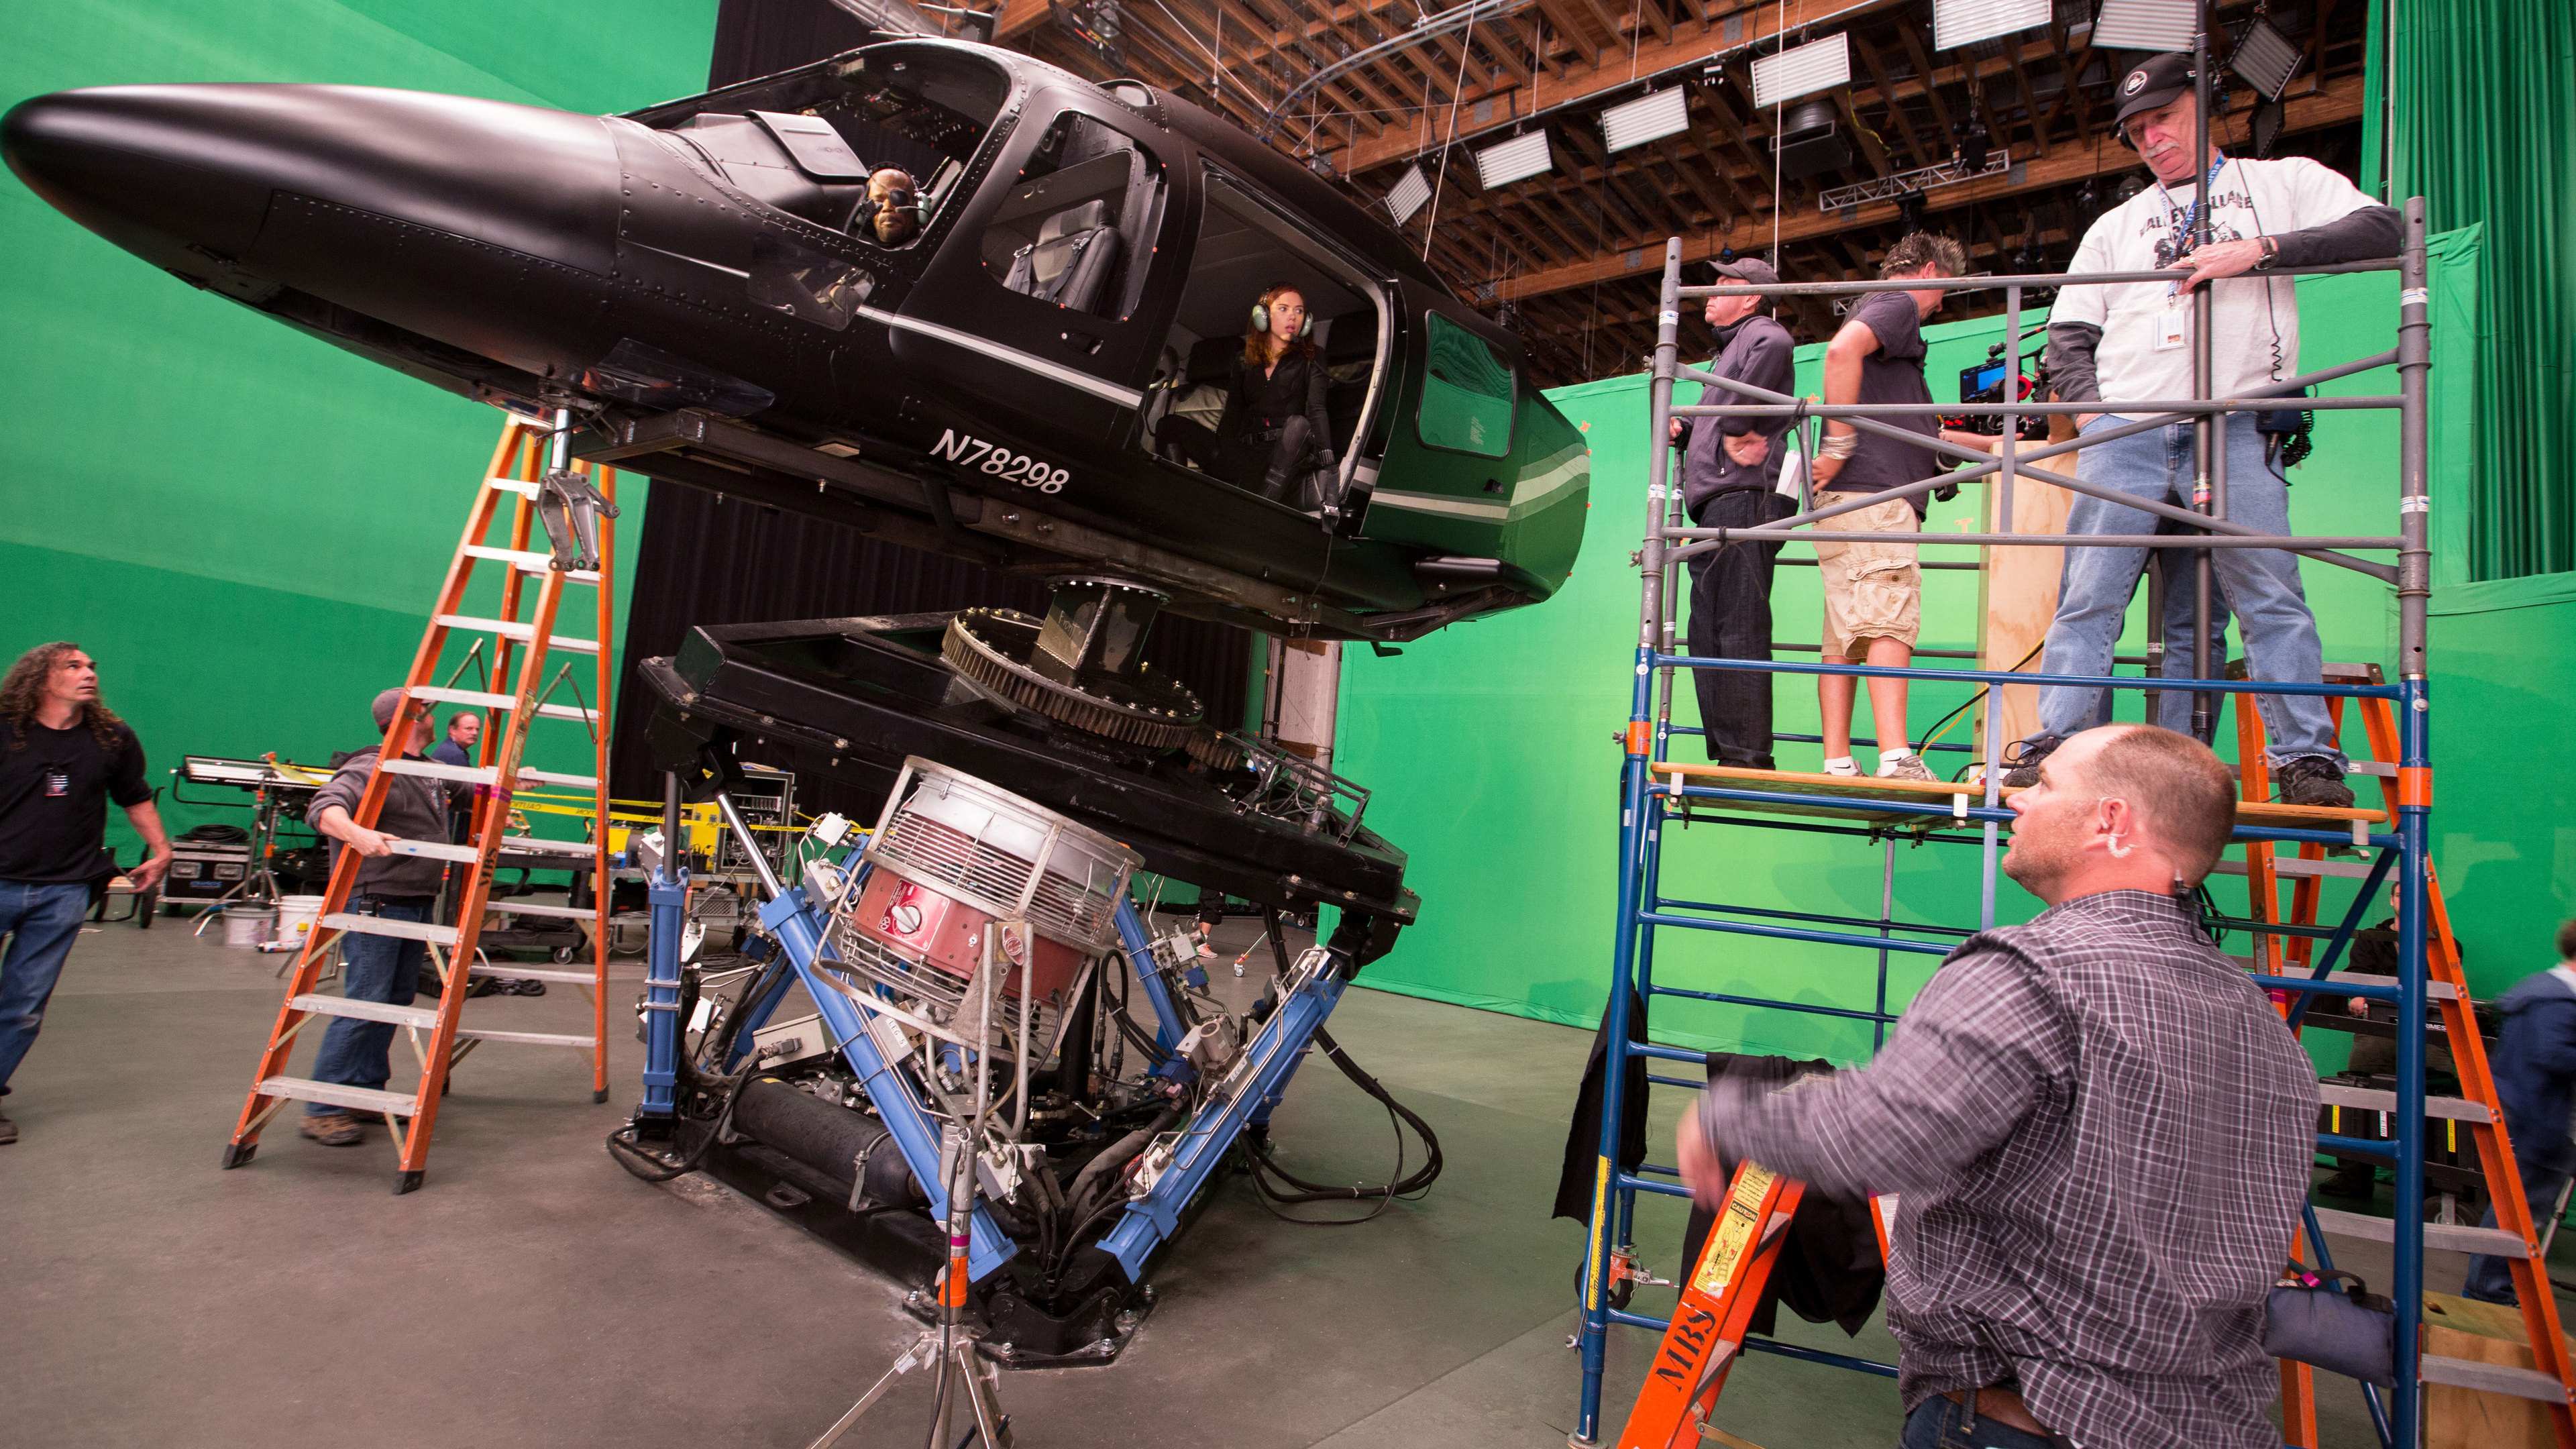 Behind-the-scenes photo of actors Samuel L. Jackson (Nick Fury) and Scarlett Johansson (Natasha Romanoff/Black Widow) in Captain America: The Winter Soldier.